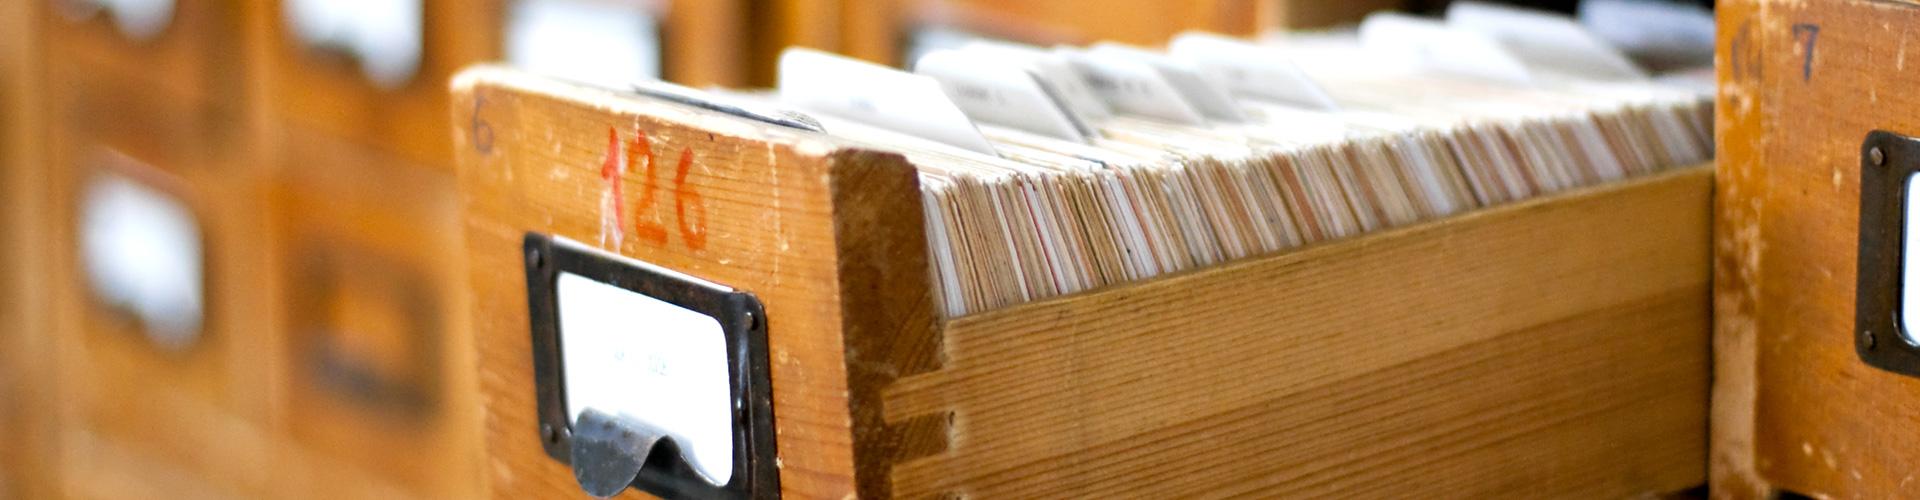 Slider Archiv